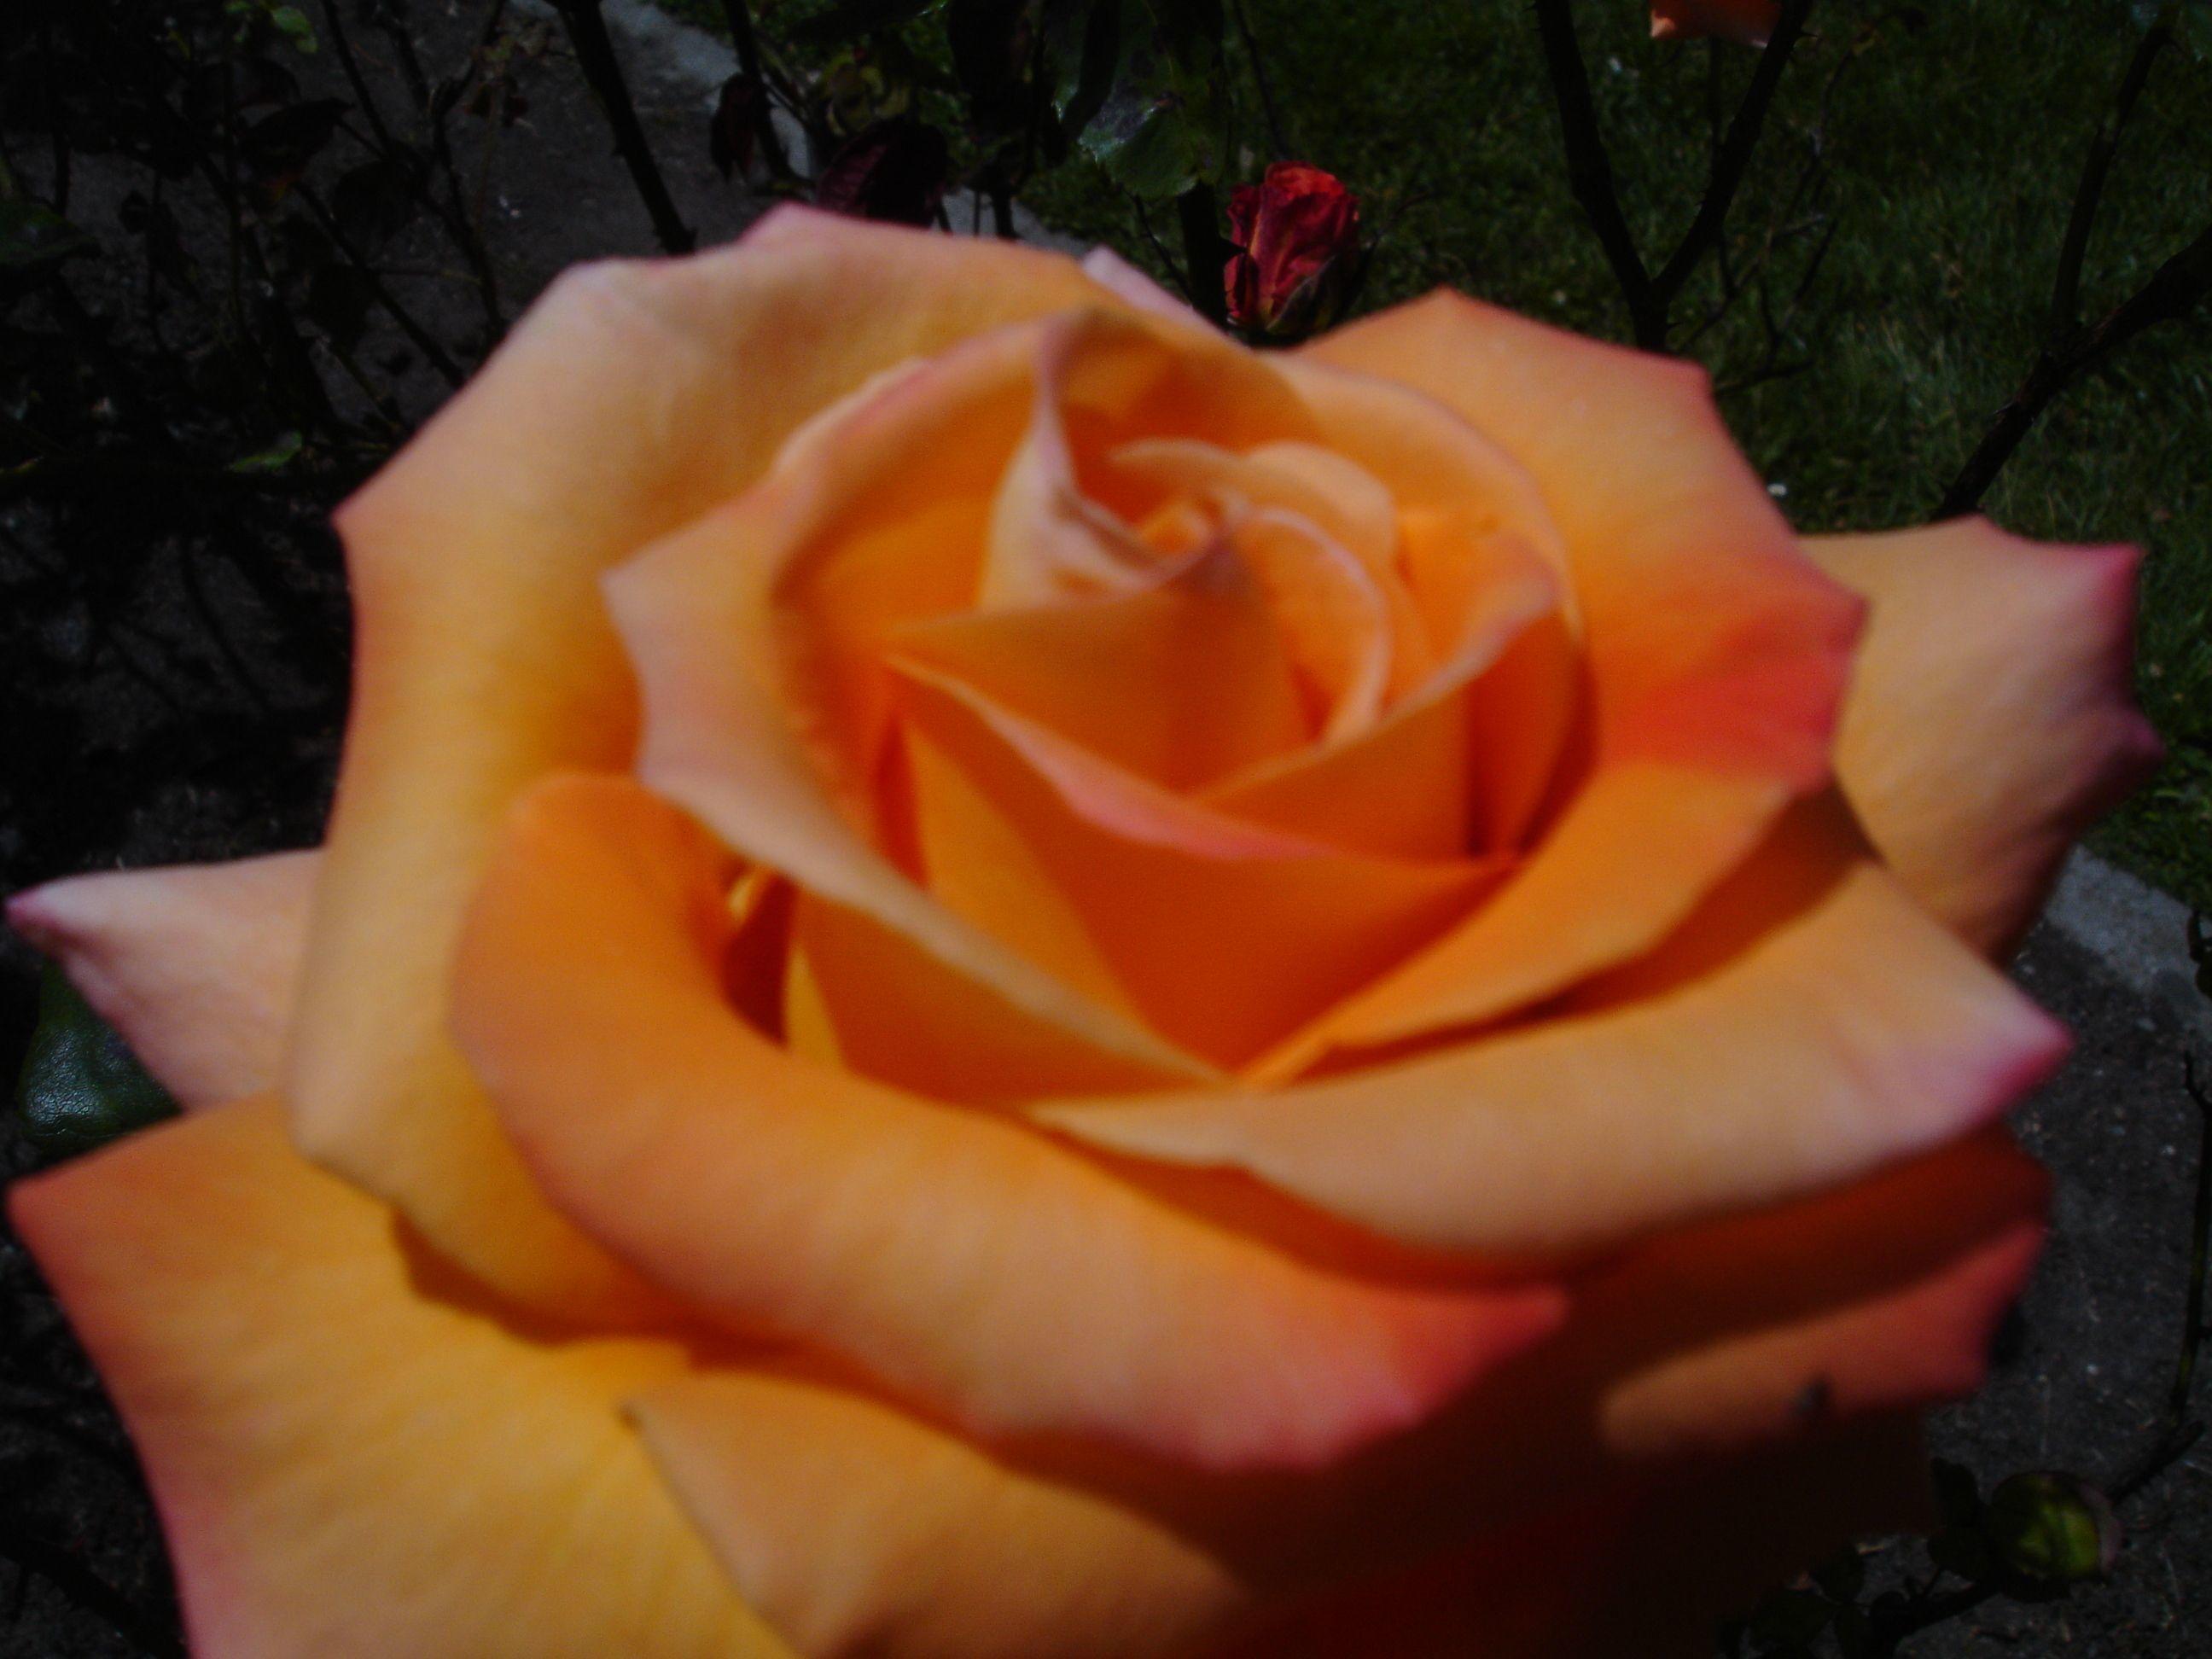 gardening singles dating site